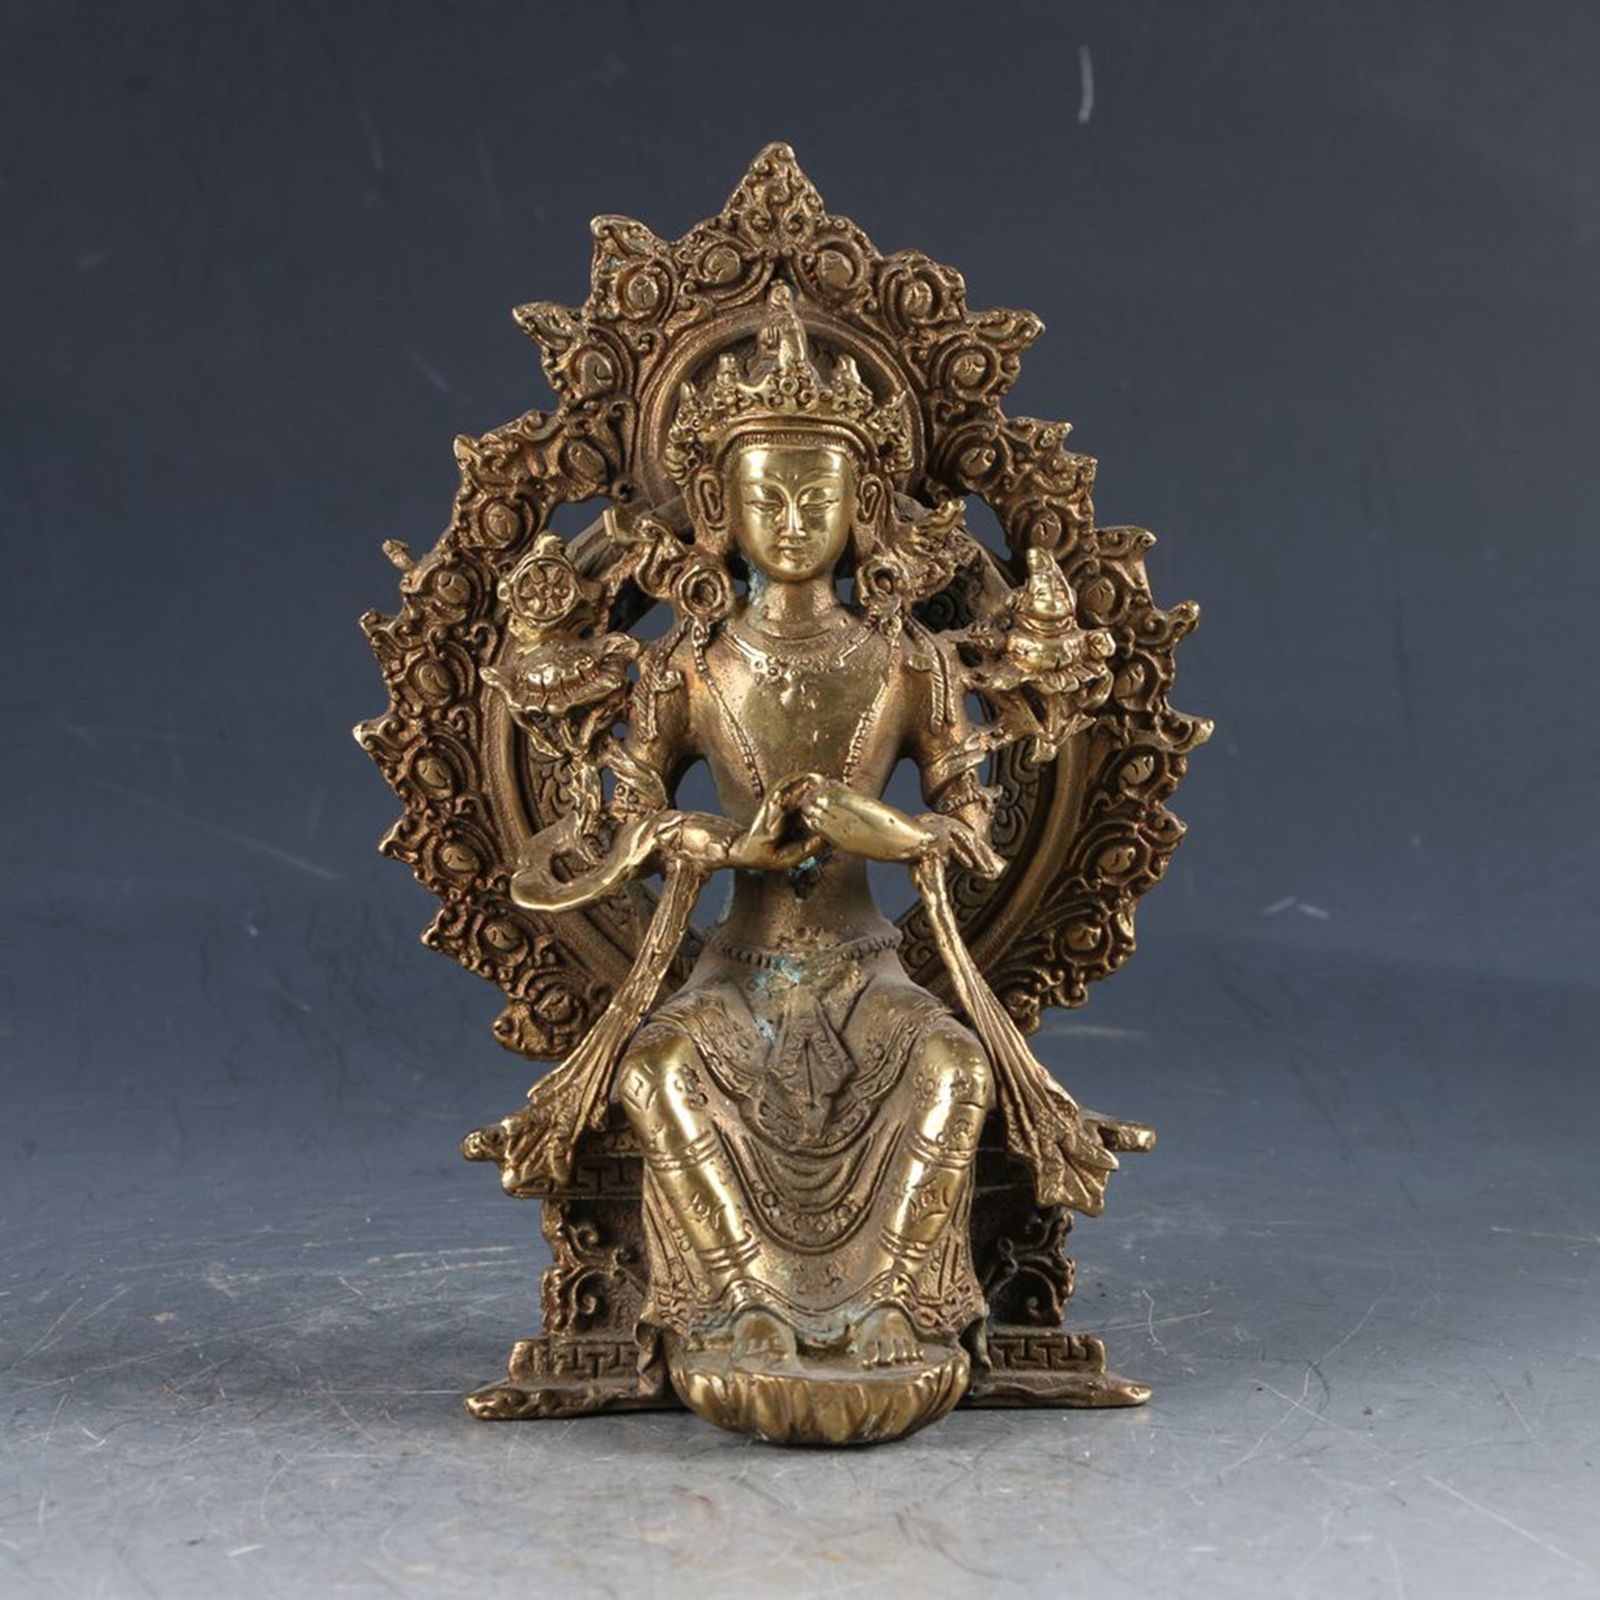 Chinese Brass Tibetan Buddhism Handwork Carved Kwan-Yin StatueChinese Brass Tibetan Buddhism Handwork Carved Kwan-Yin Statue